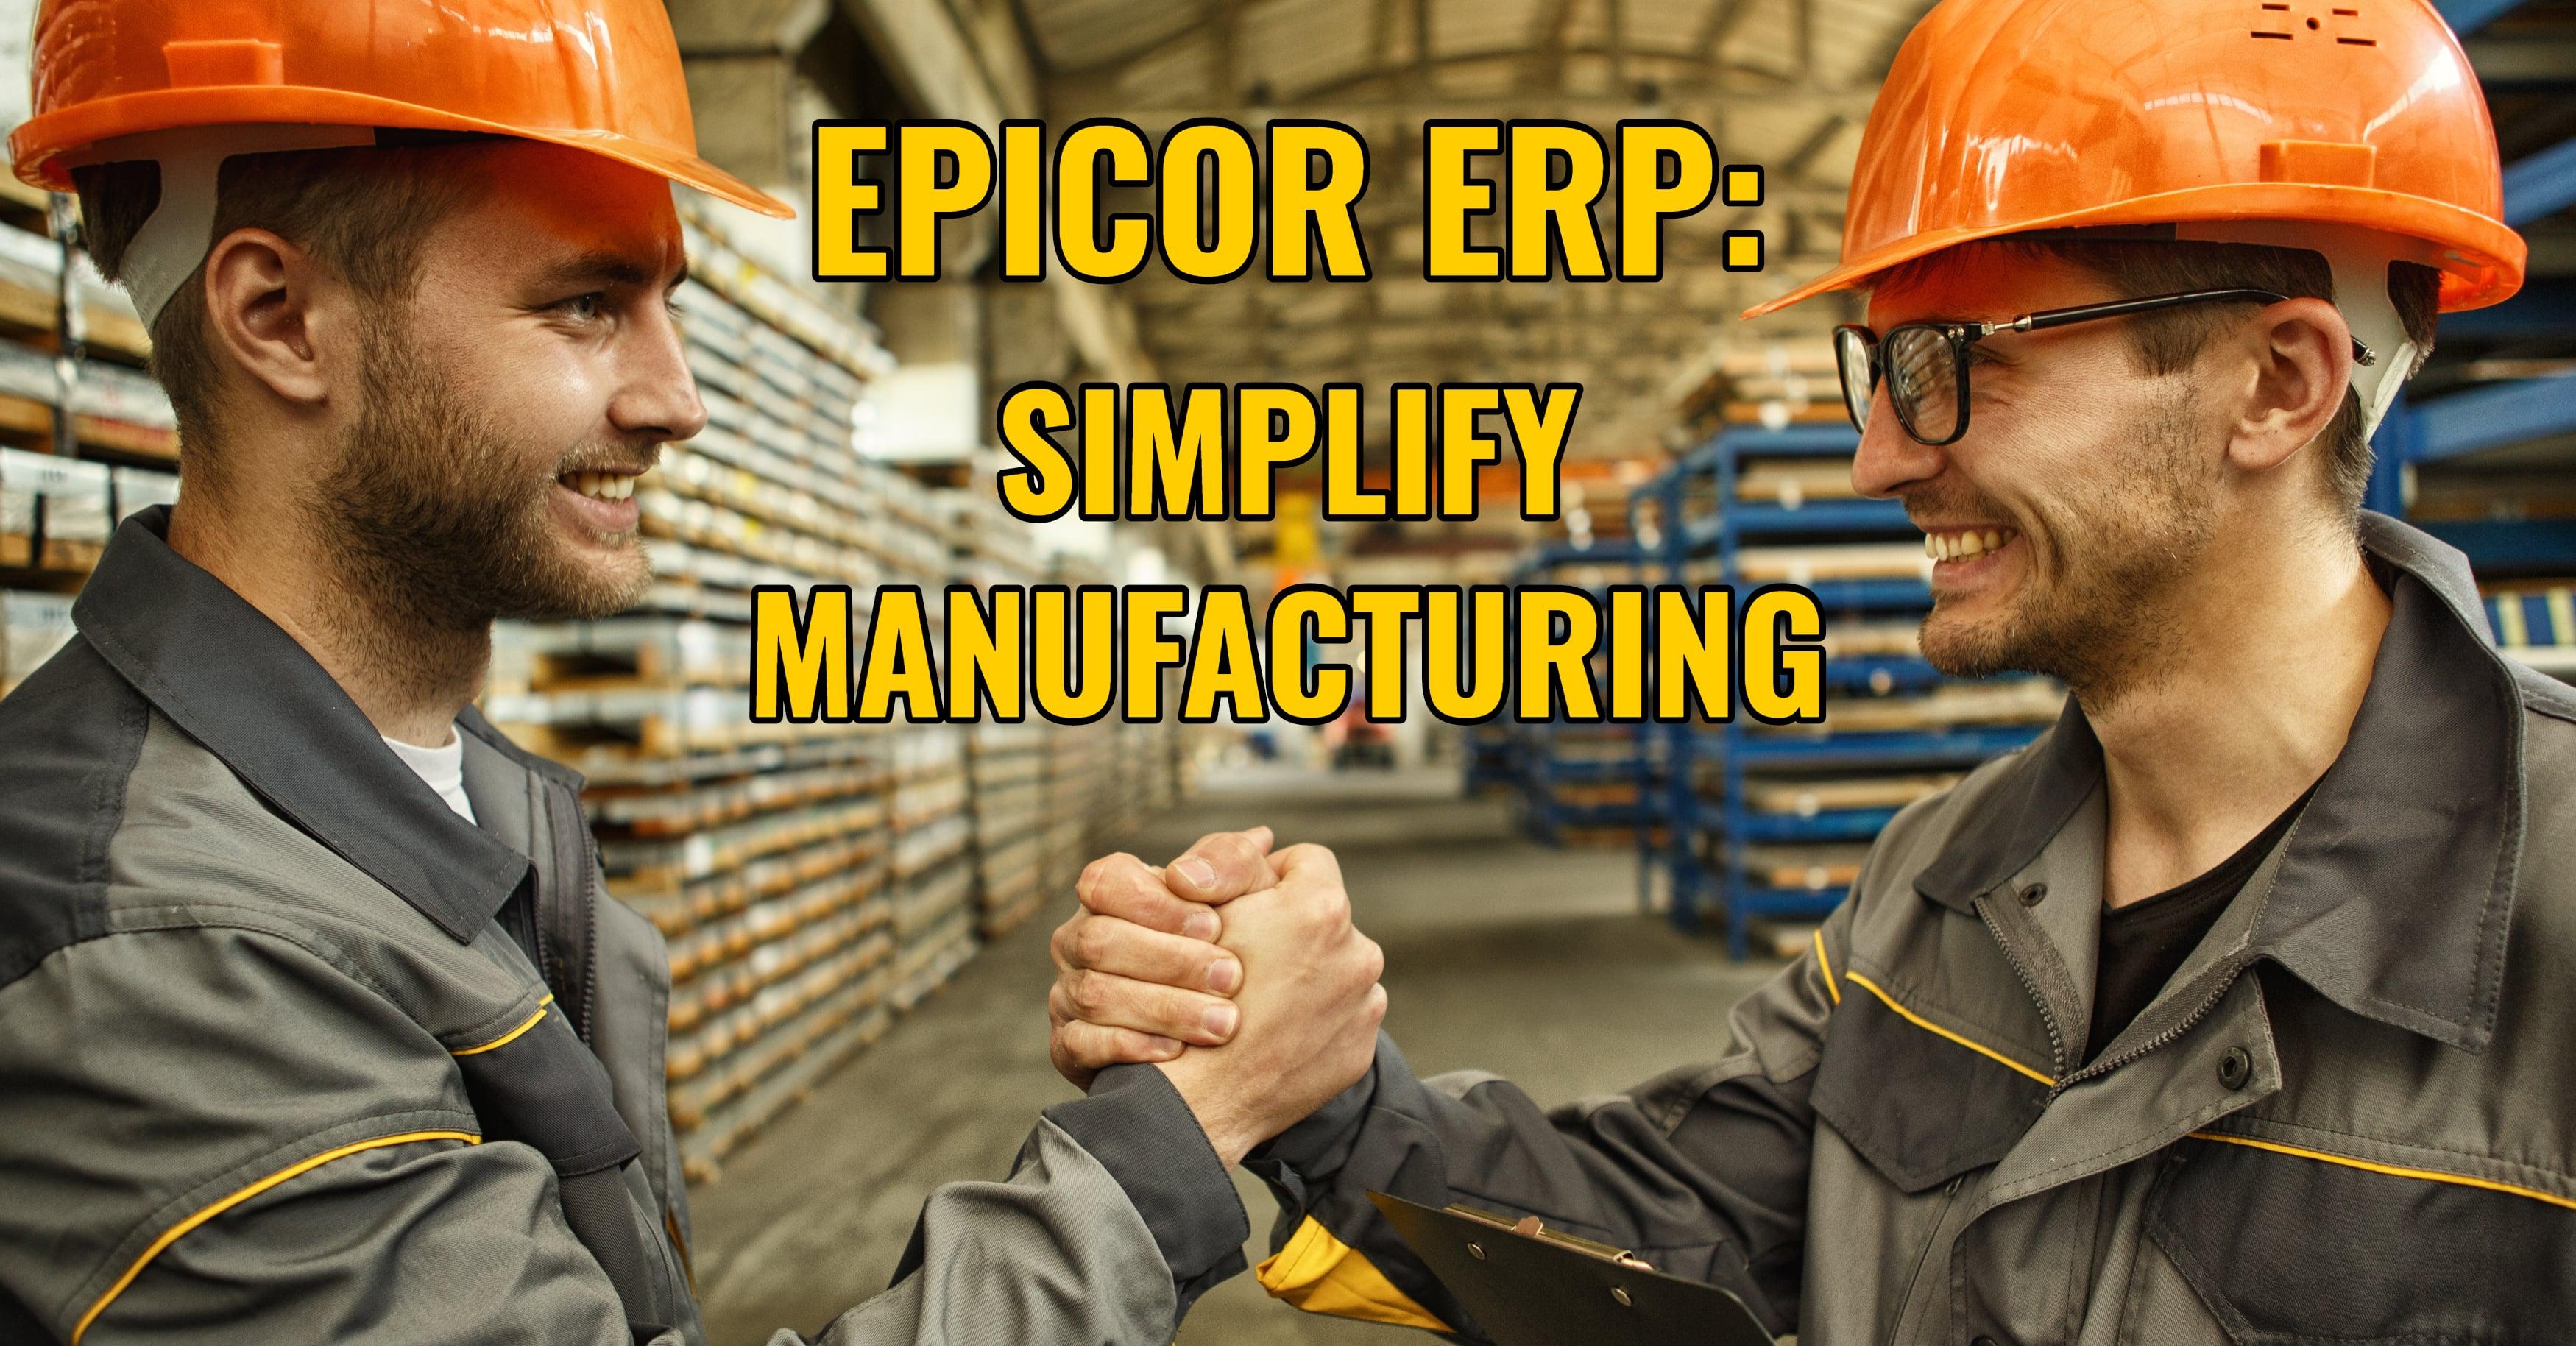 Epicor ERP Manufacturer